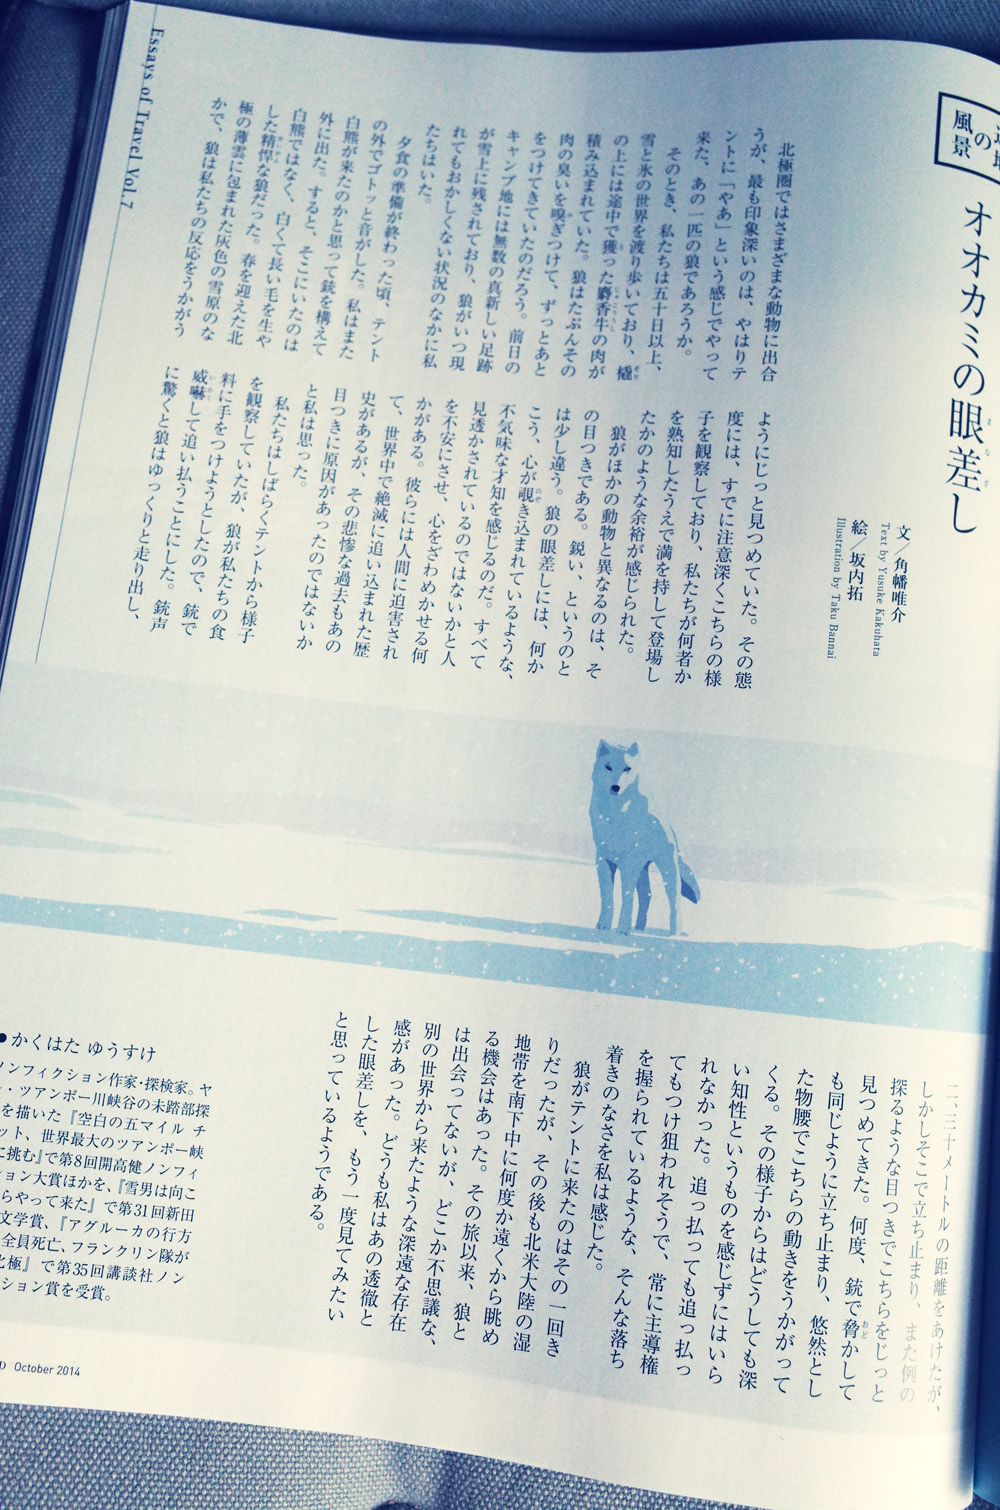 JAL「SKYWARD」10月号 辺地の風景。  今回は北極に生きるオオカミを描いています。 北極の白い世界に、白いオオカミ。 白のイメージを邪魔しないような背景や影の配色を模索した1枚です。  角幡さんの文章、オオカミとの距離感がすごく伝わってきて素敵でした。 そんな、クールな雰囲気がうまく伝わるといいのですが。。